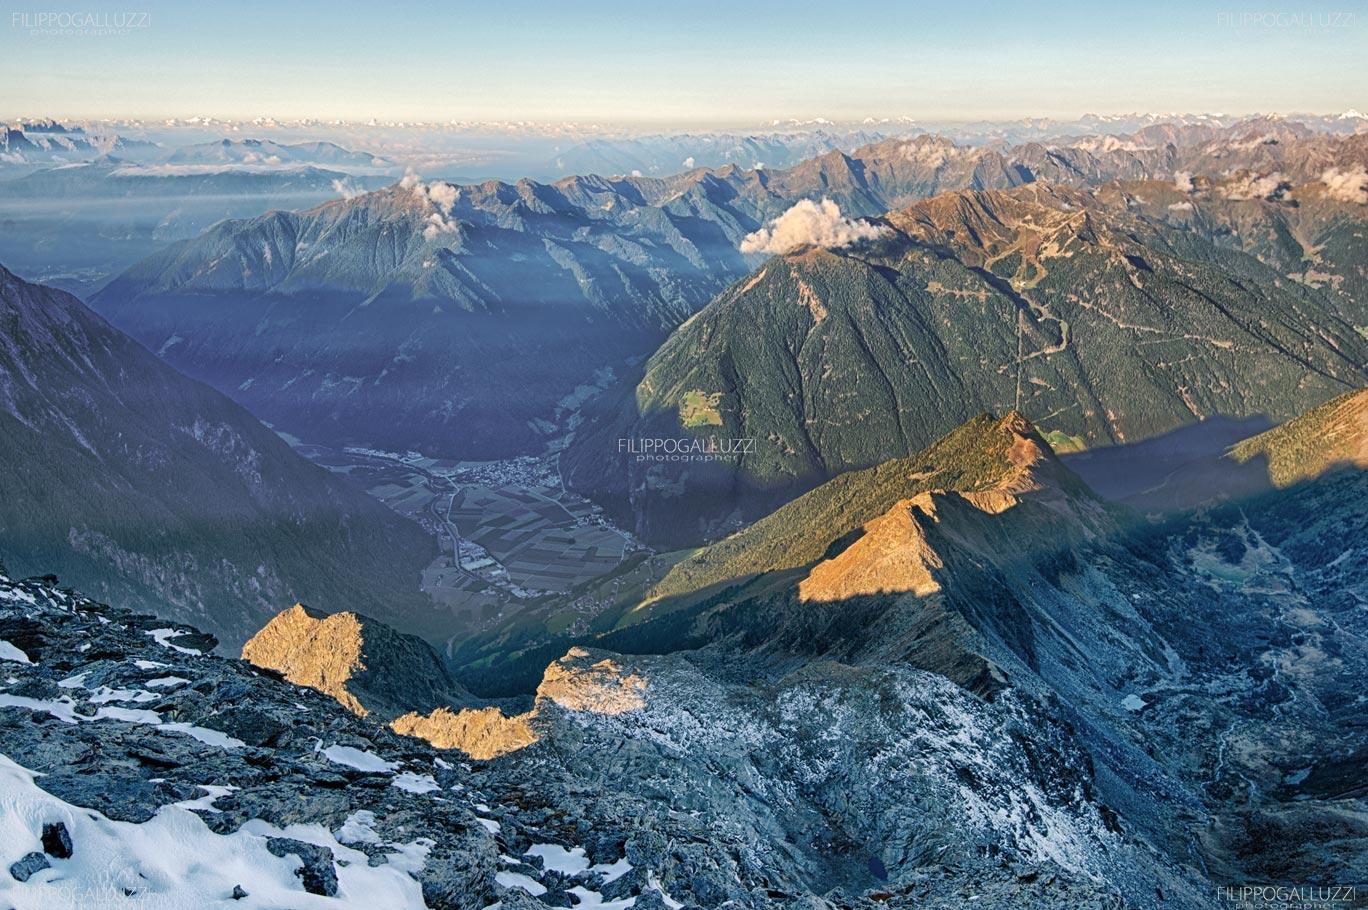 Le valli di Tures e Aurina, Grosser Moostock